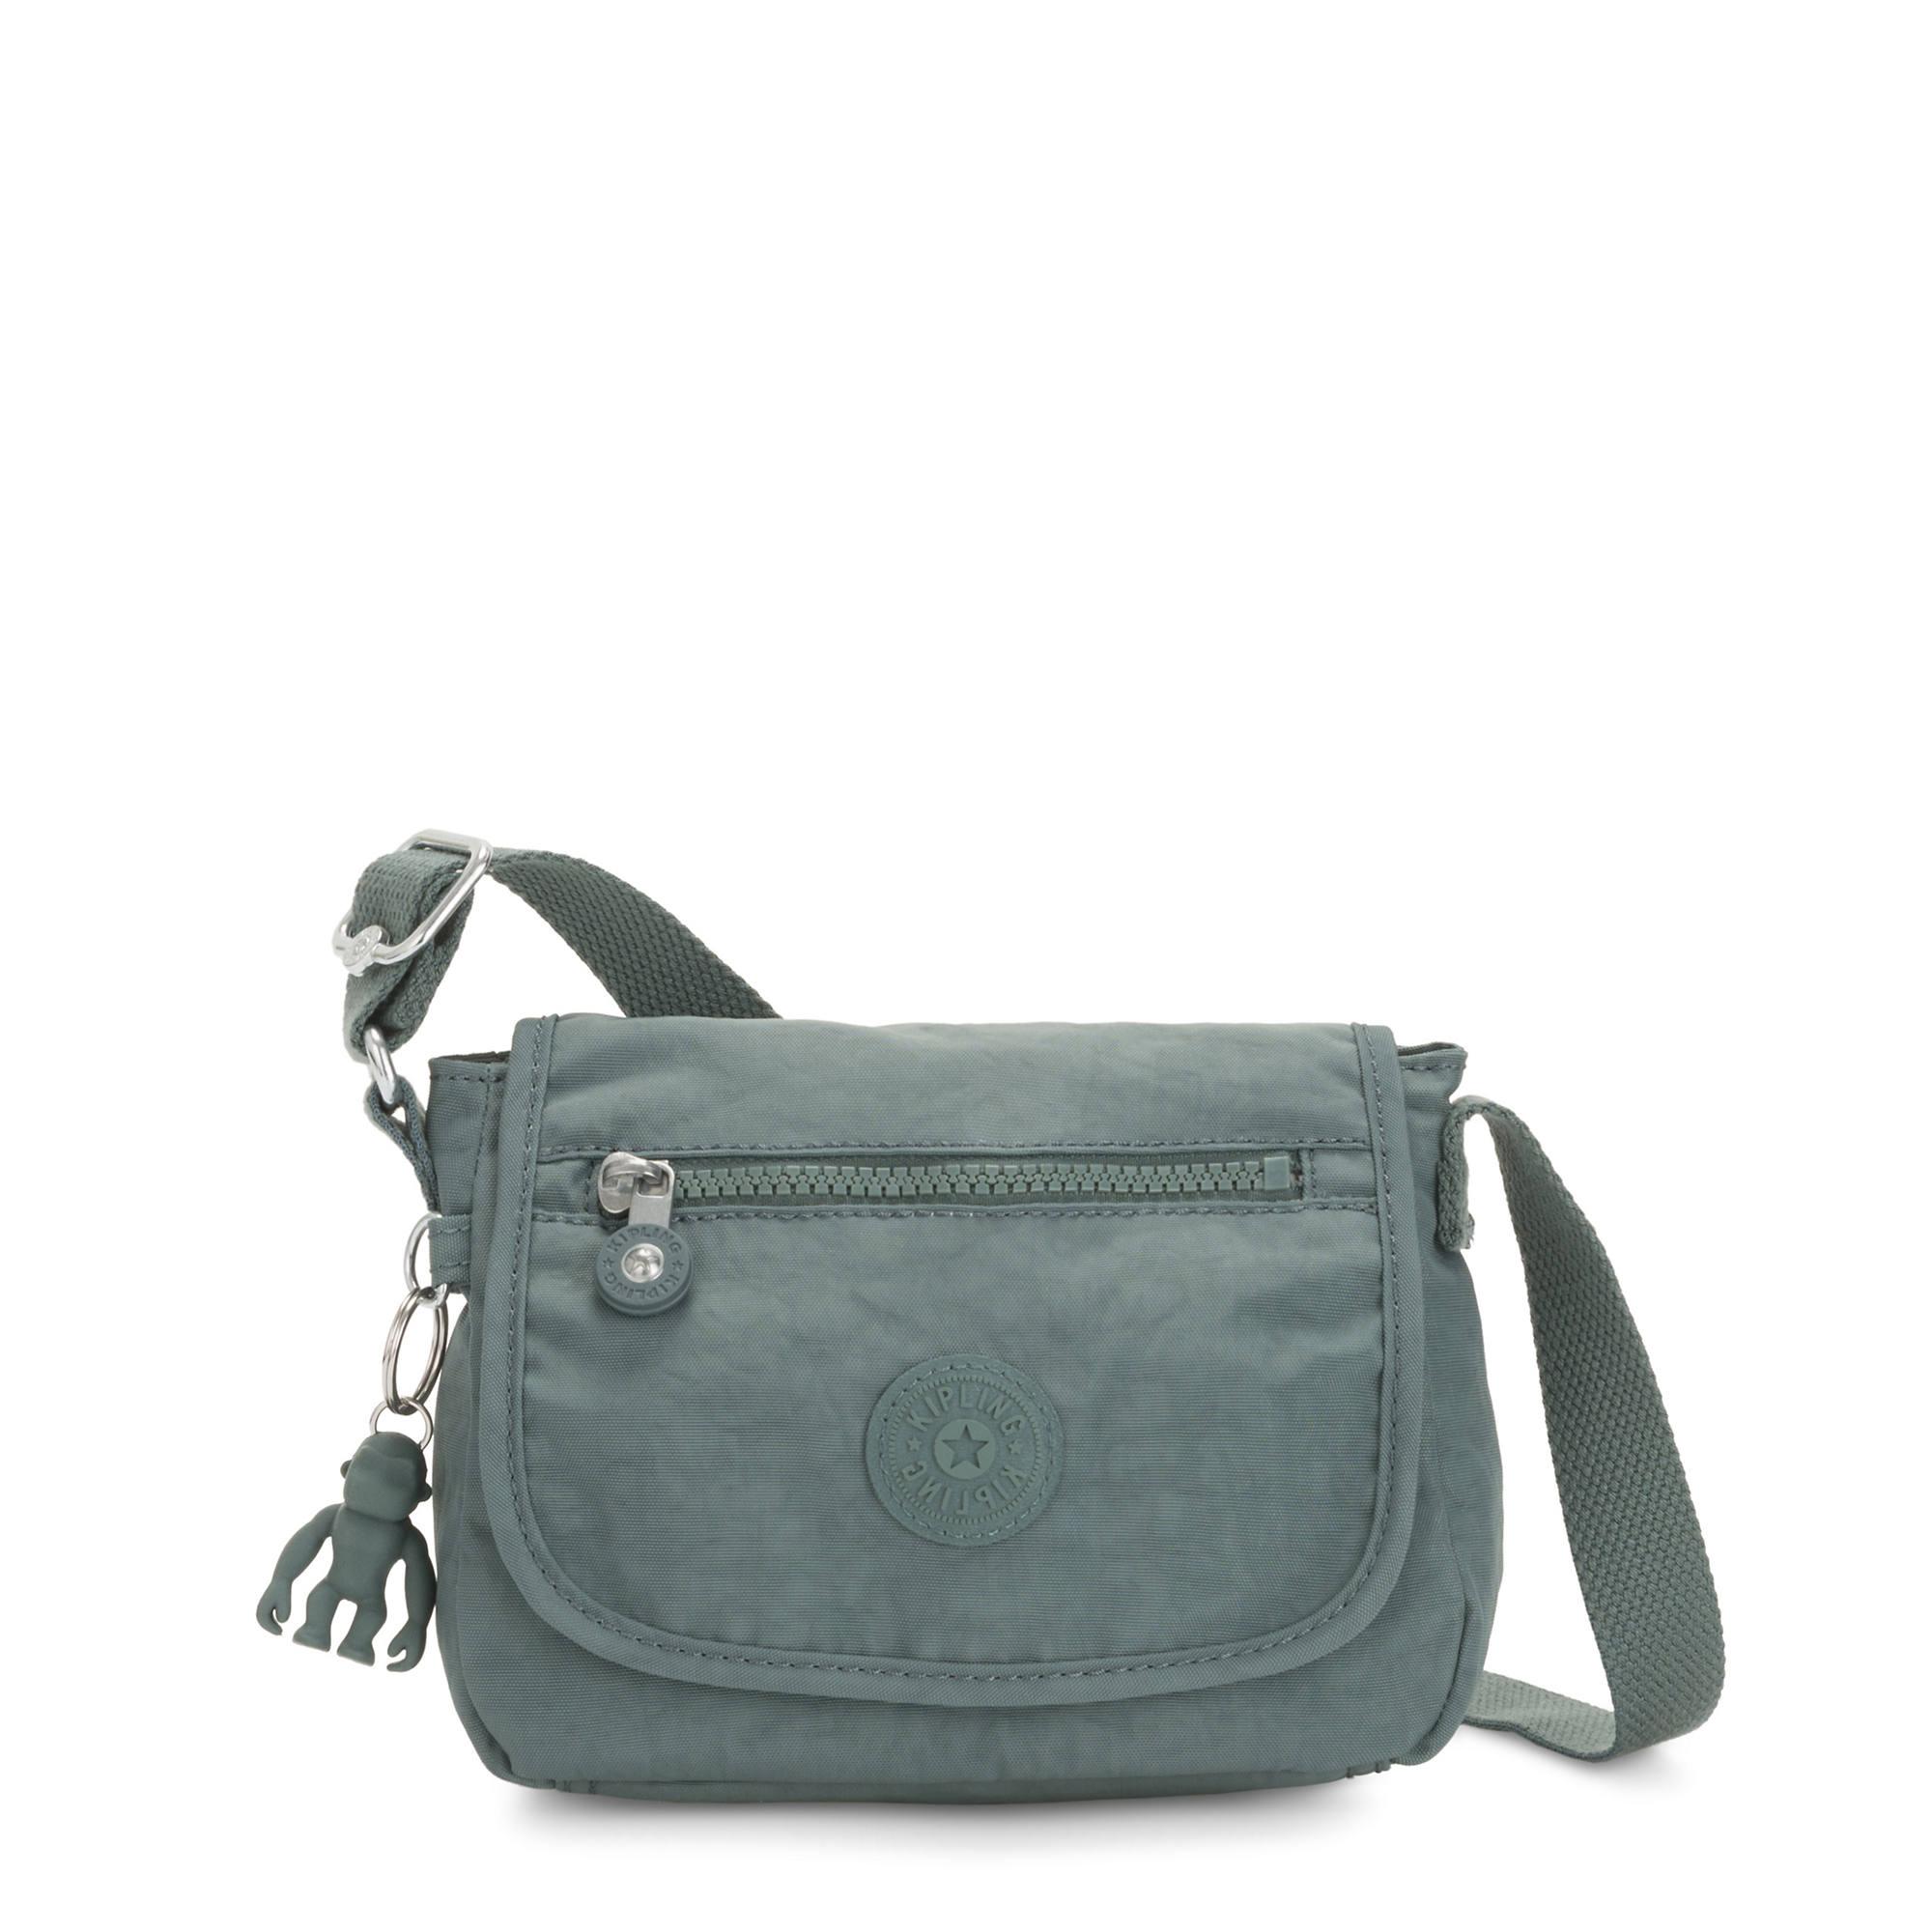 Kipling Stacking Coupons: Sabian Crossbody Mini Bag $20.39, Alber 3-in-1 Convertible Mini Backpack $30.59 & More + Free Shipping